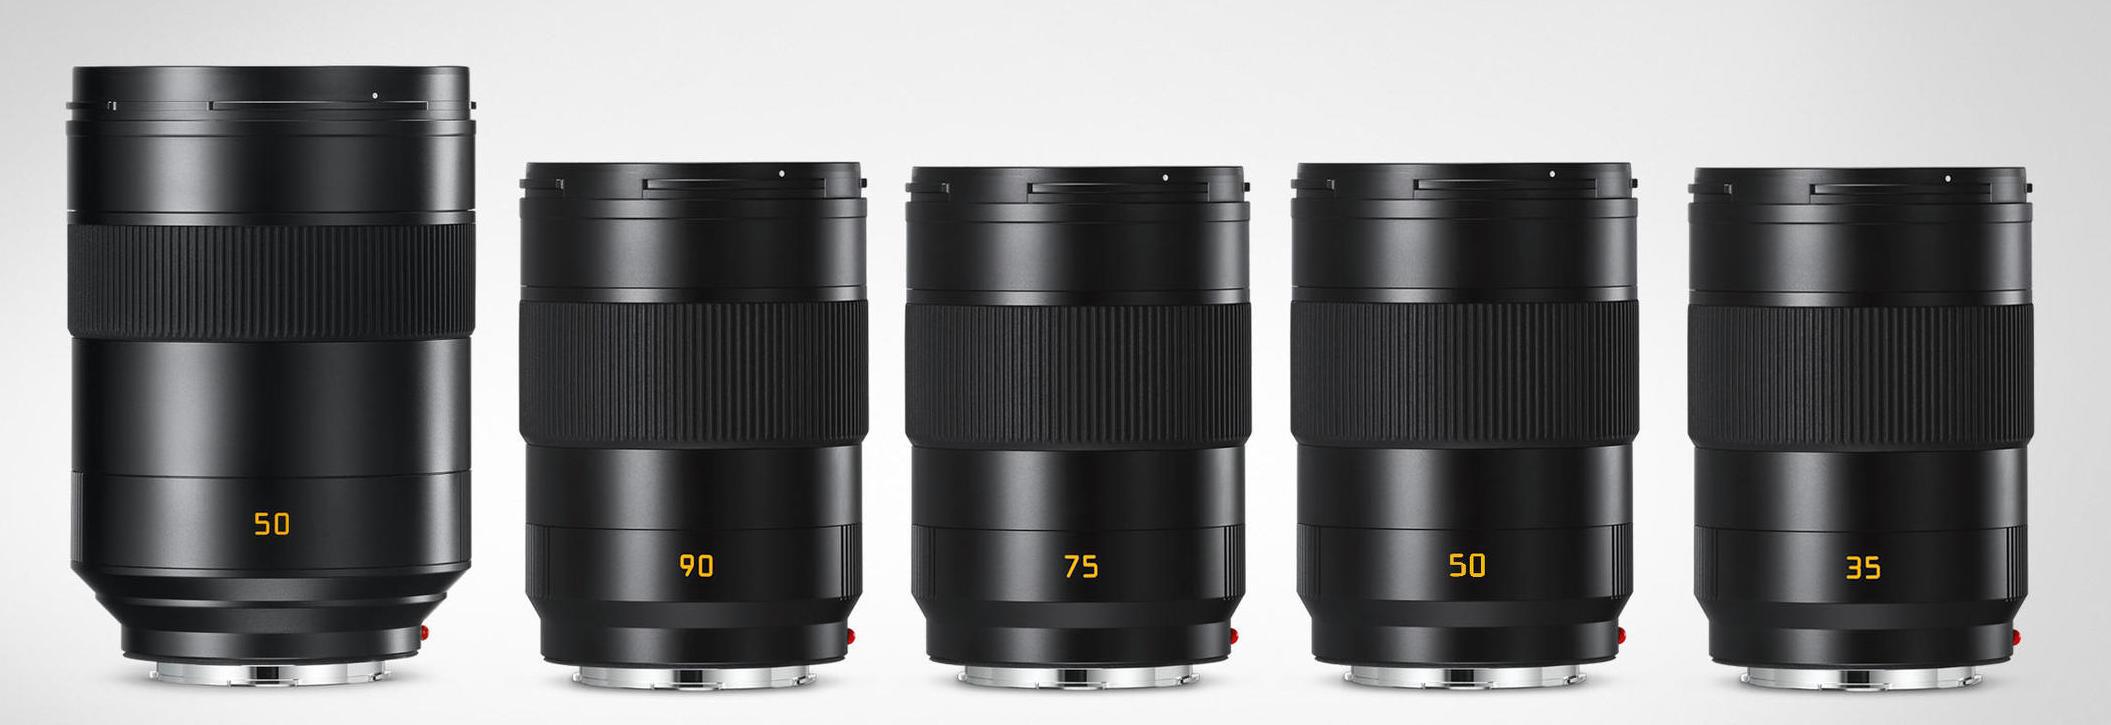 Updated Leica SL lens roadmap - Leica Rumors